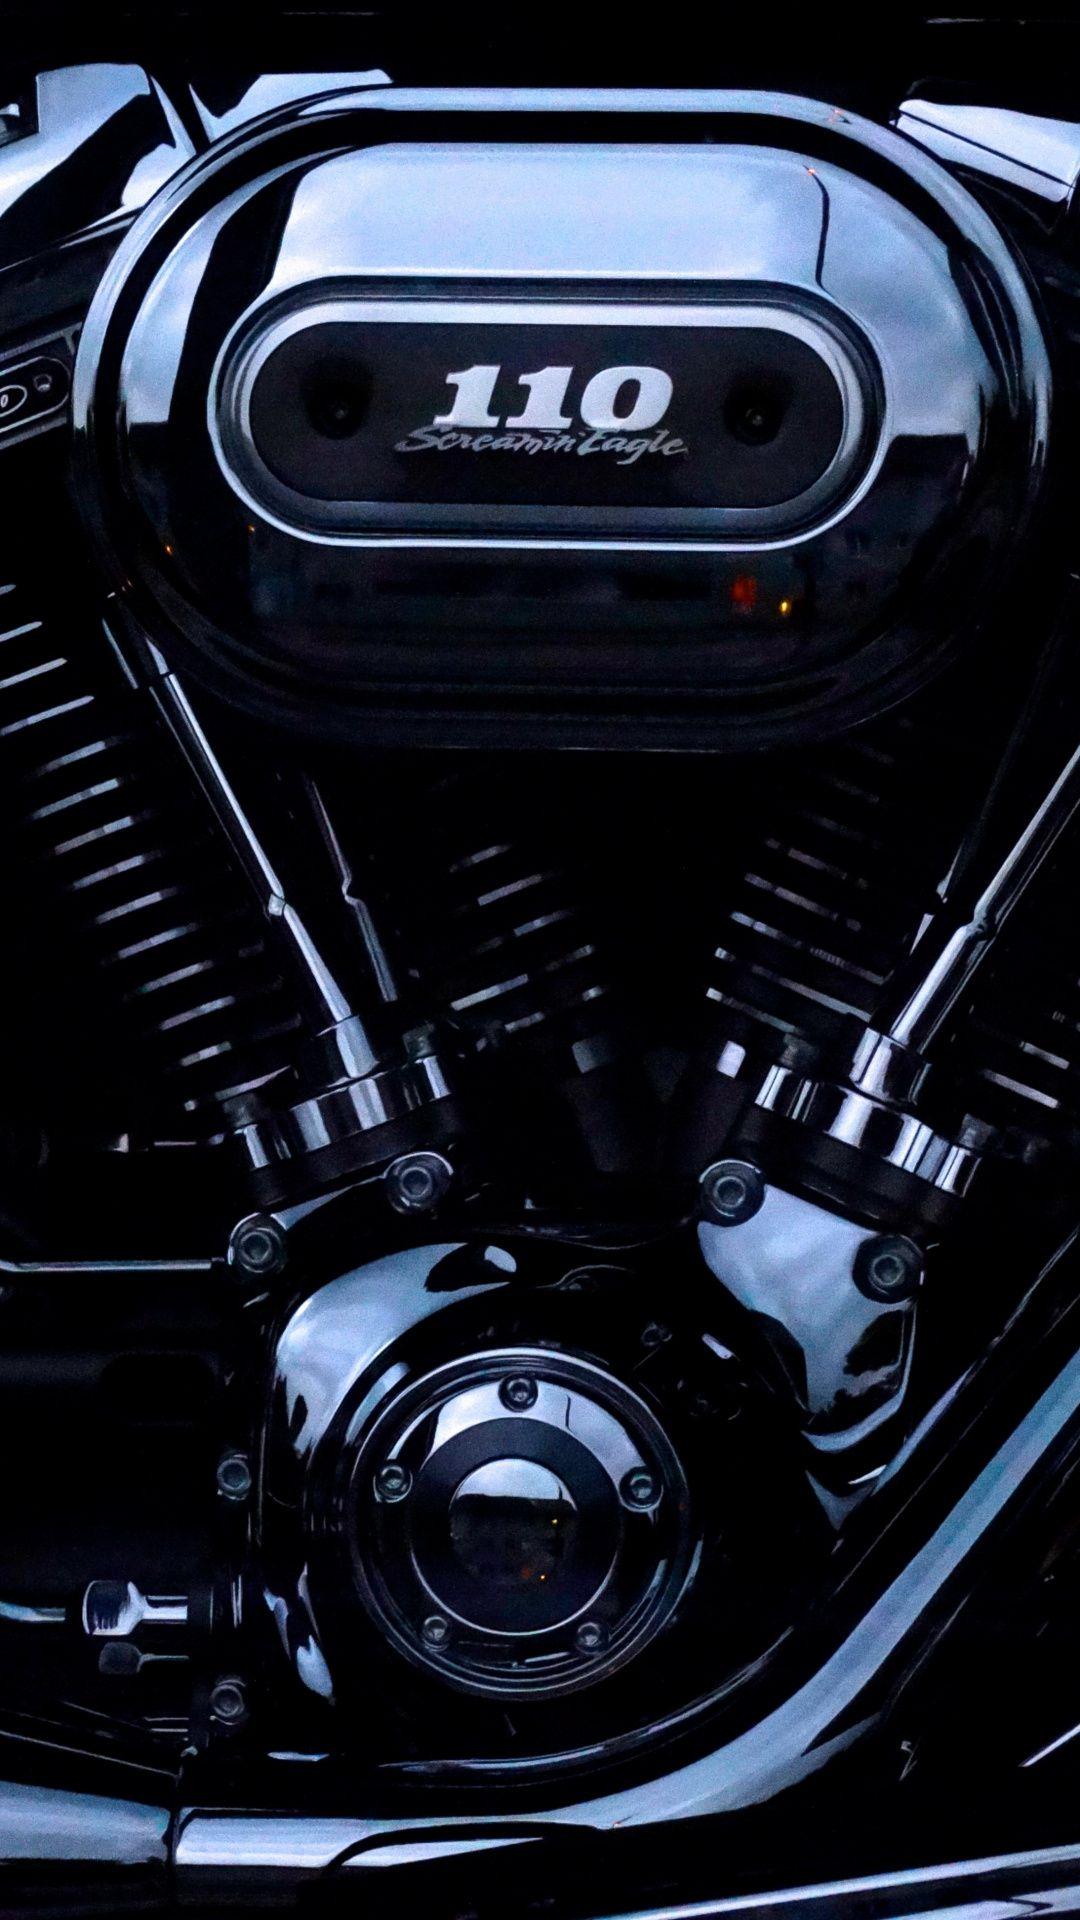 Wallpapers Engine Personal Luxury Car Harley Davidson Car Rim